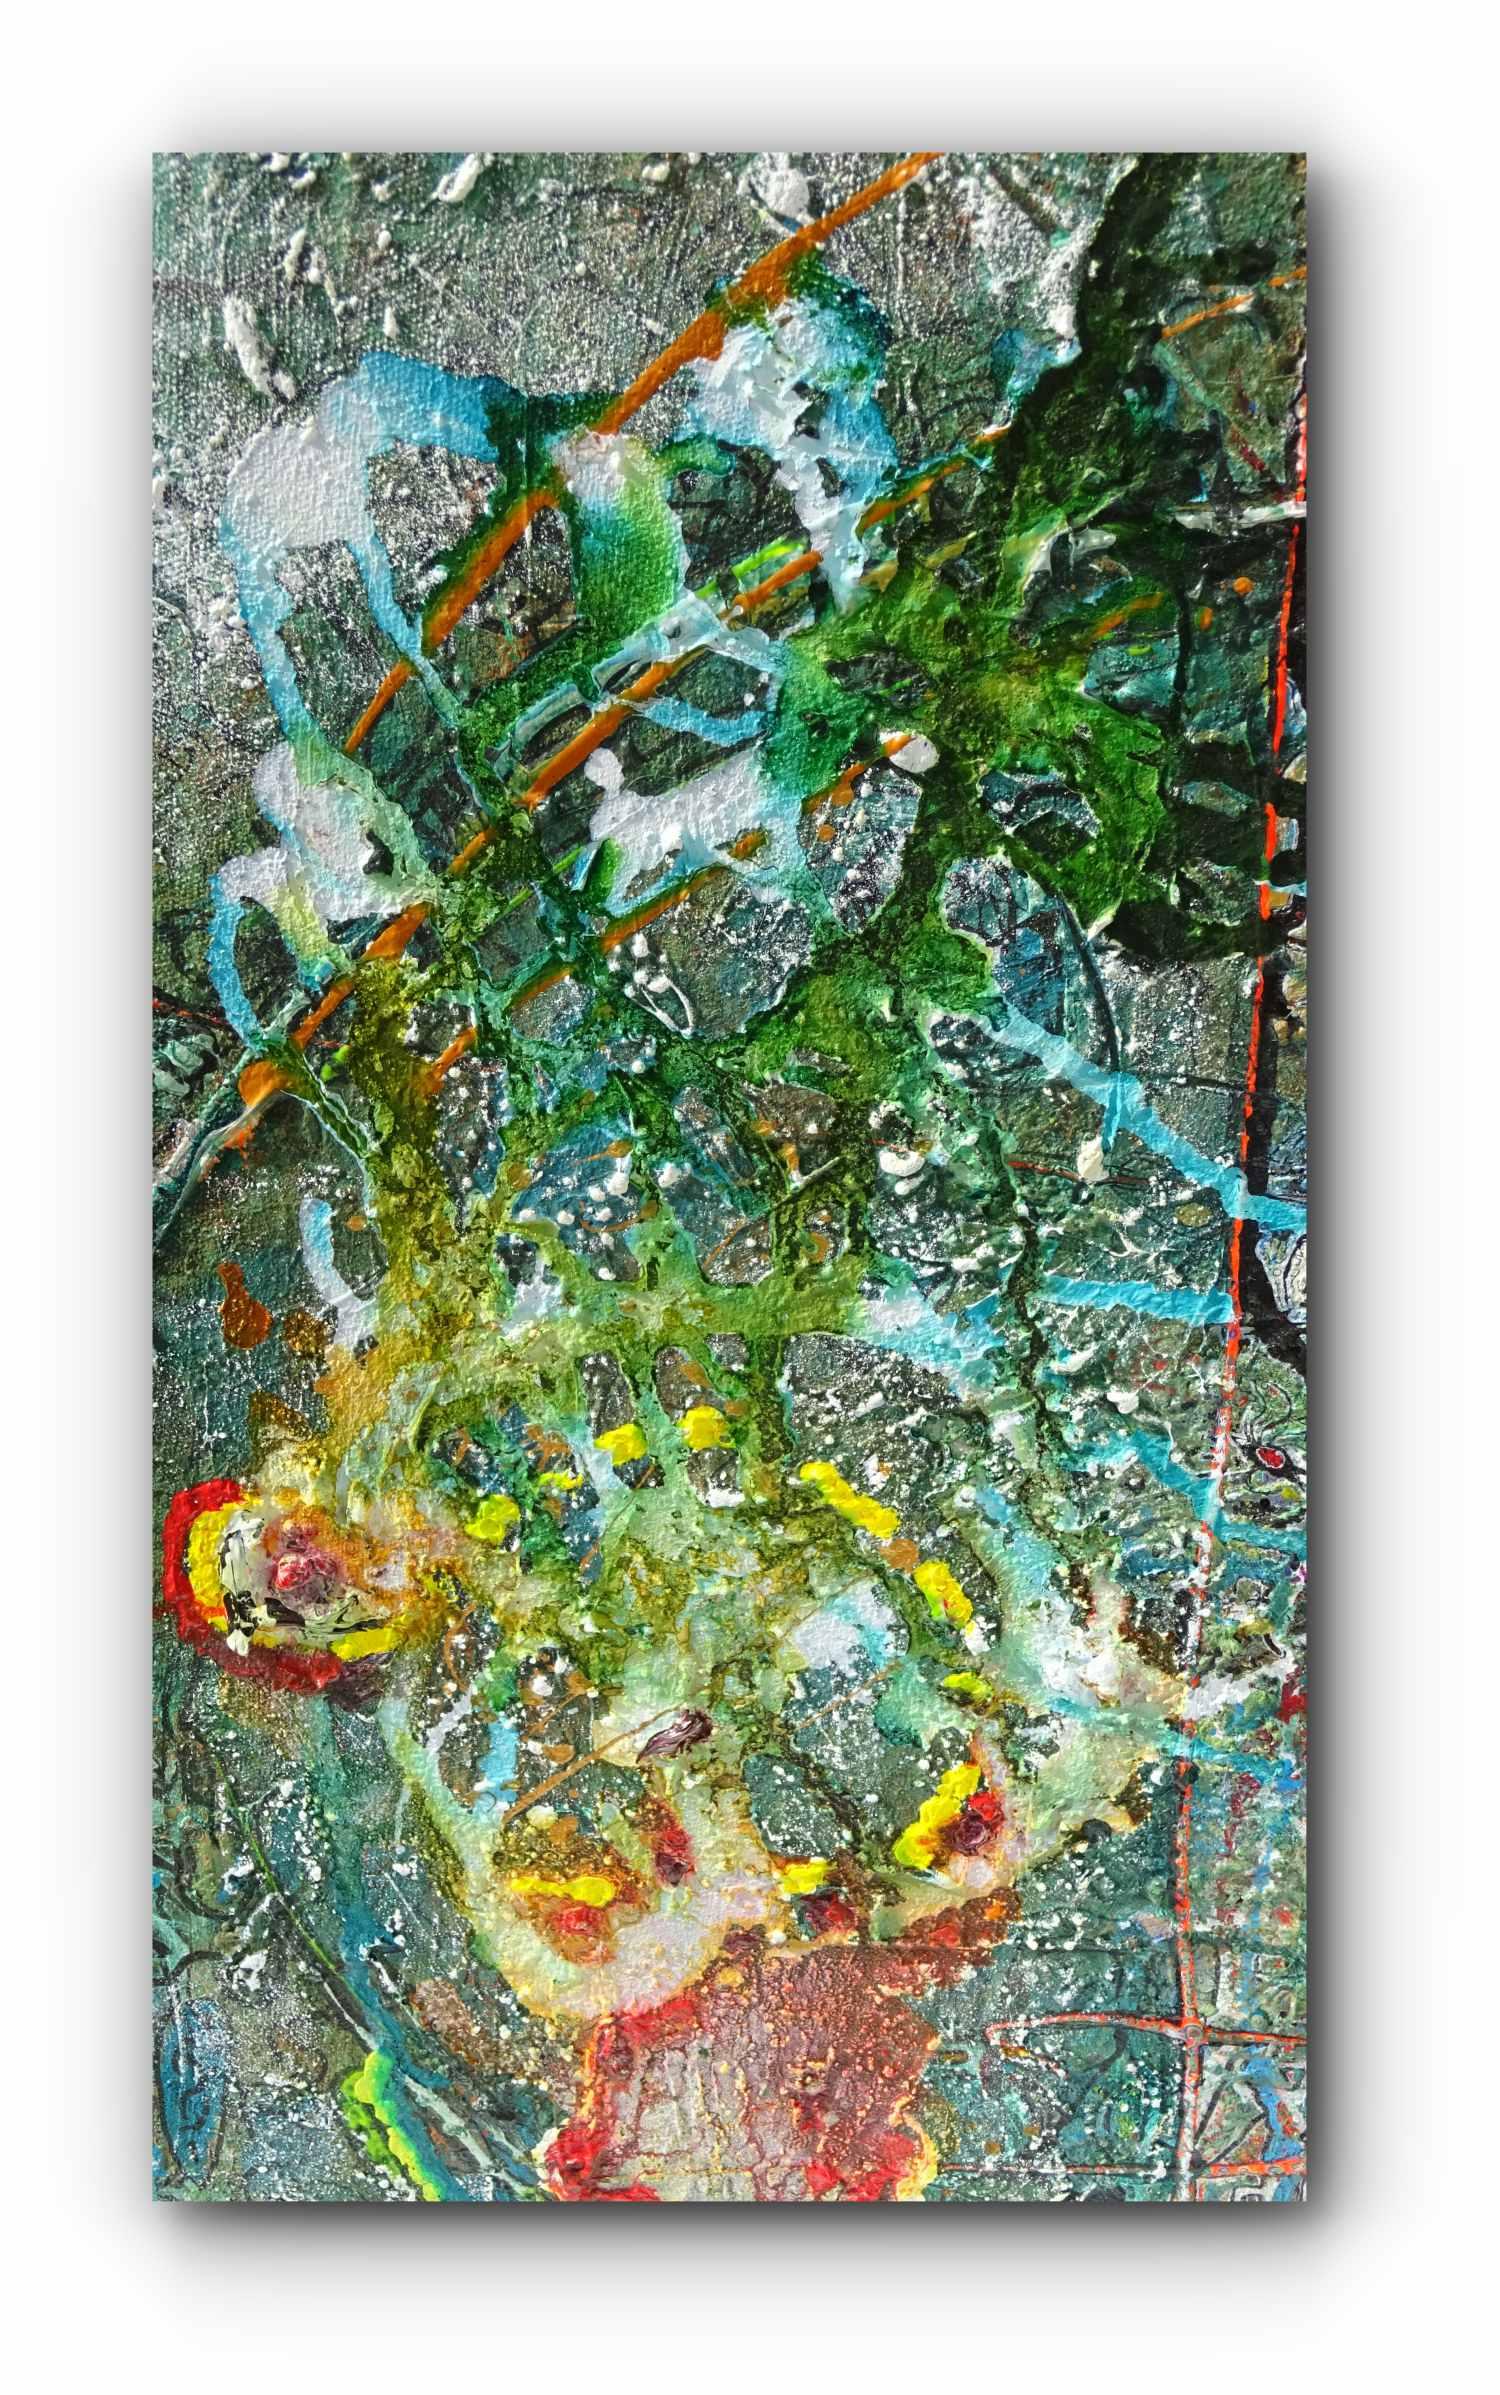 painting-detail-7-ritual-five-artists-ingress-vortices.jpg